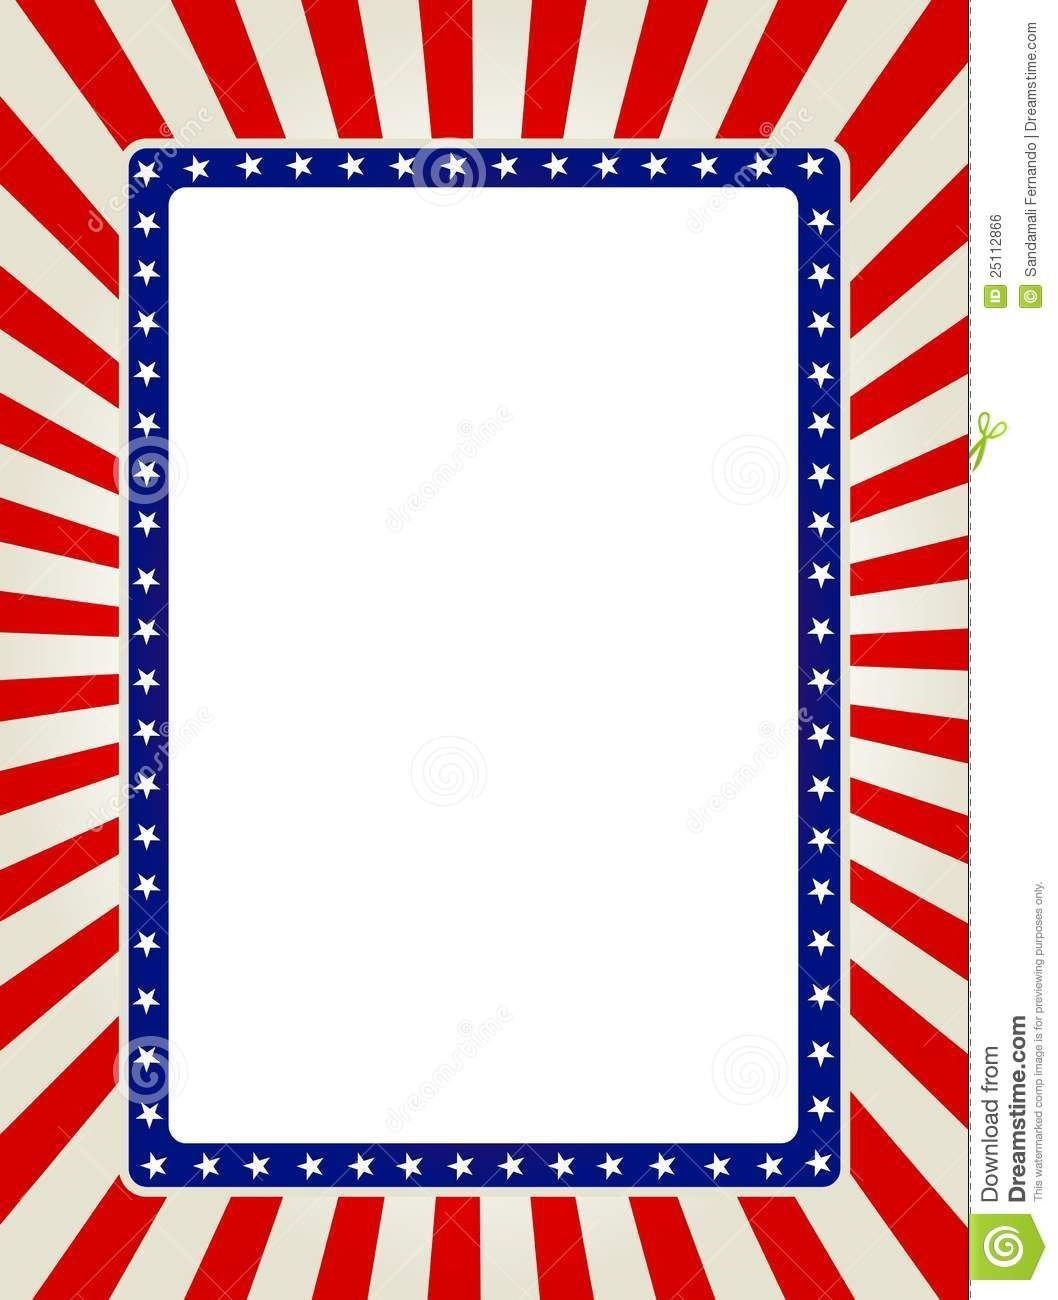 Free Patriotic Page Borders | Patriotic Border | Images | Templates - Free Printable Patriotic Writing Paper